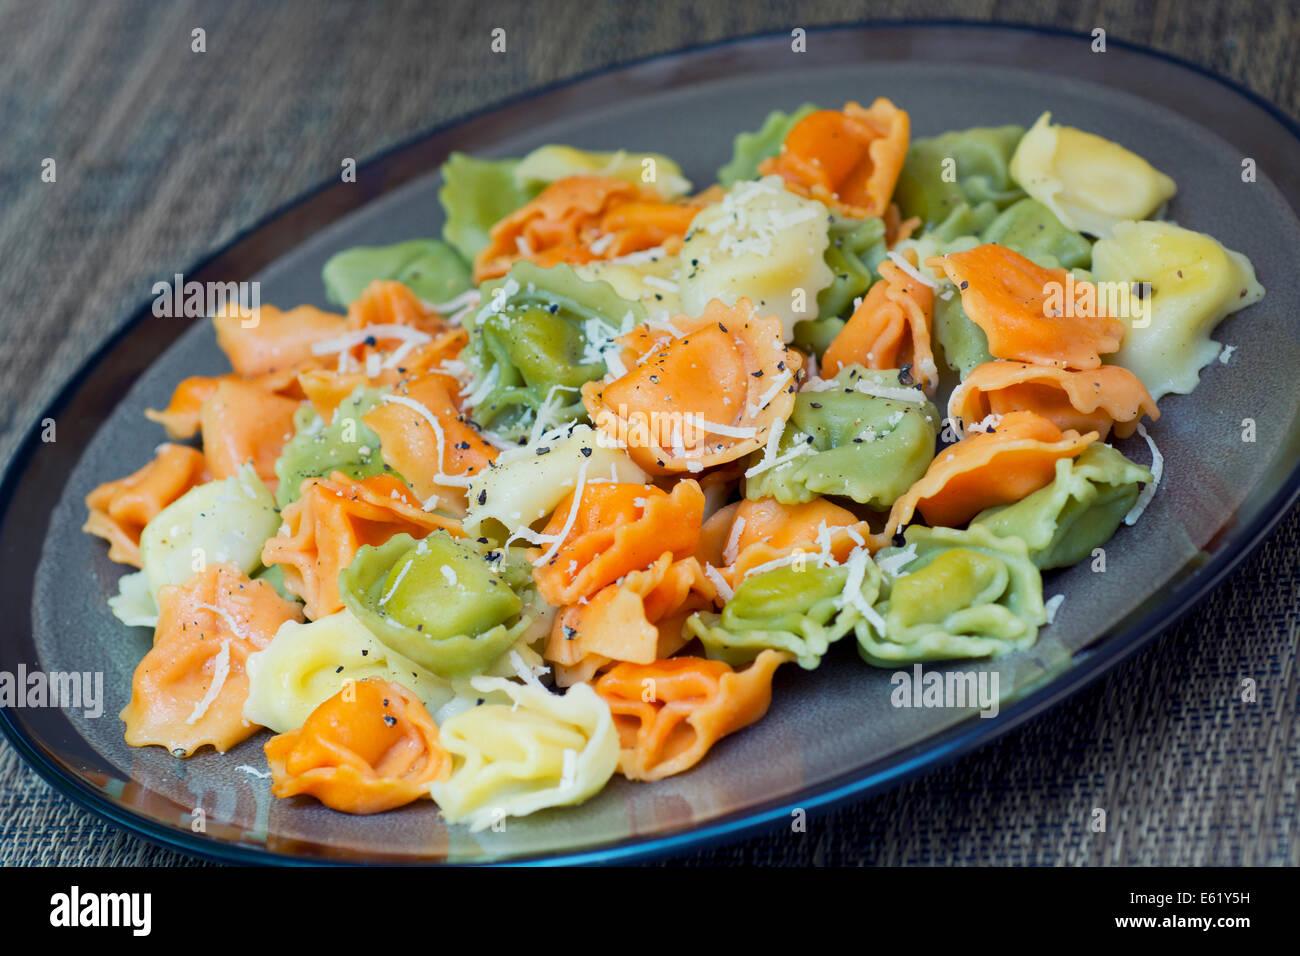 Plate of Tricolor Tortellini - Stock Image